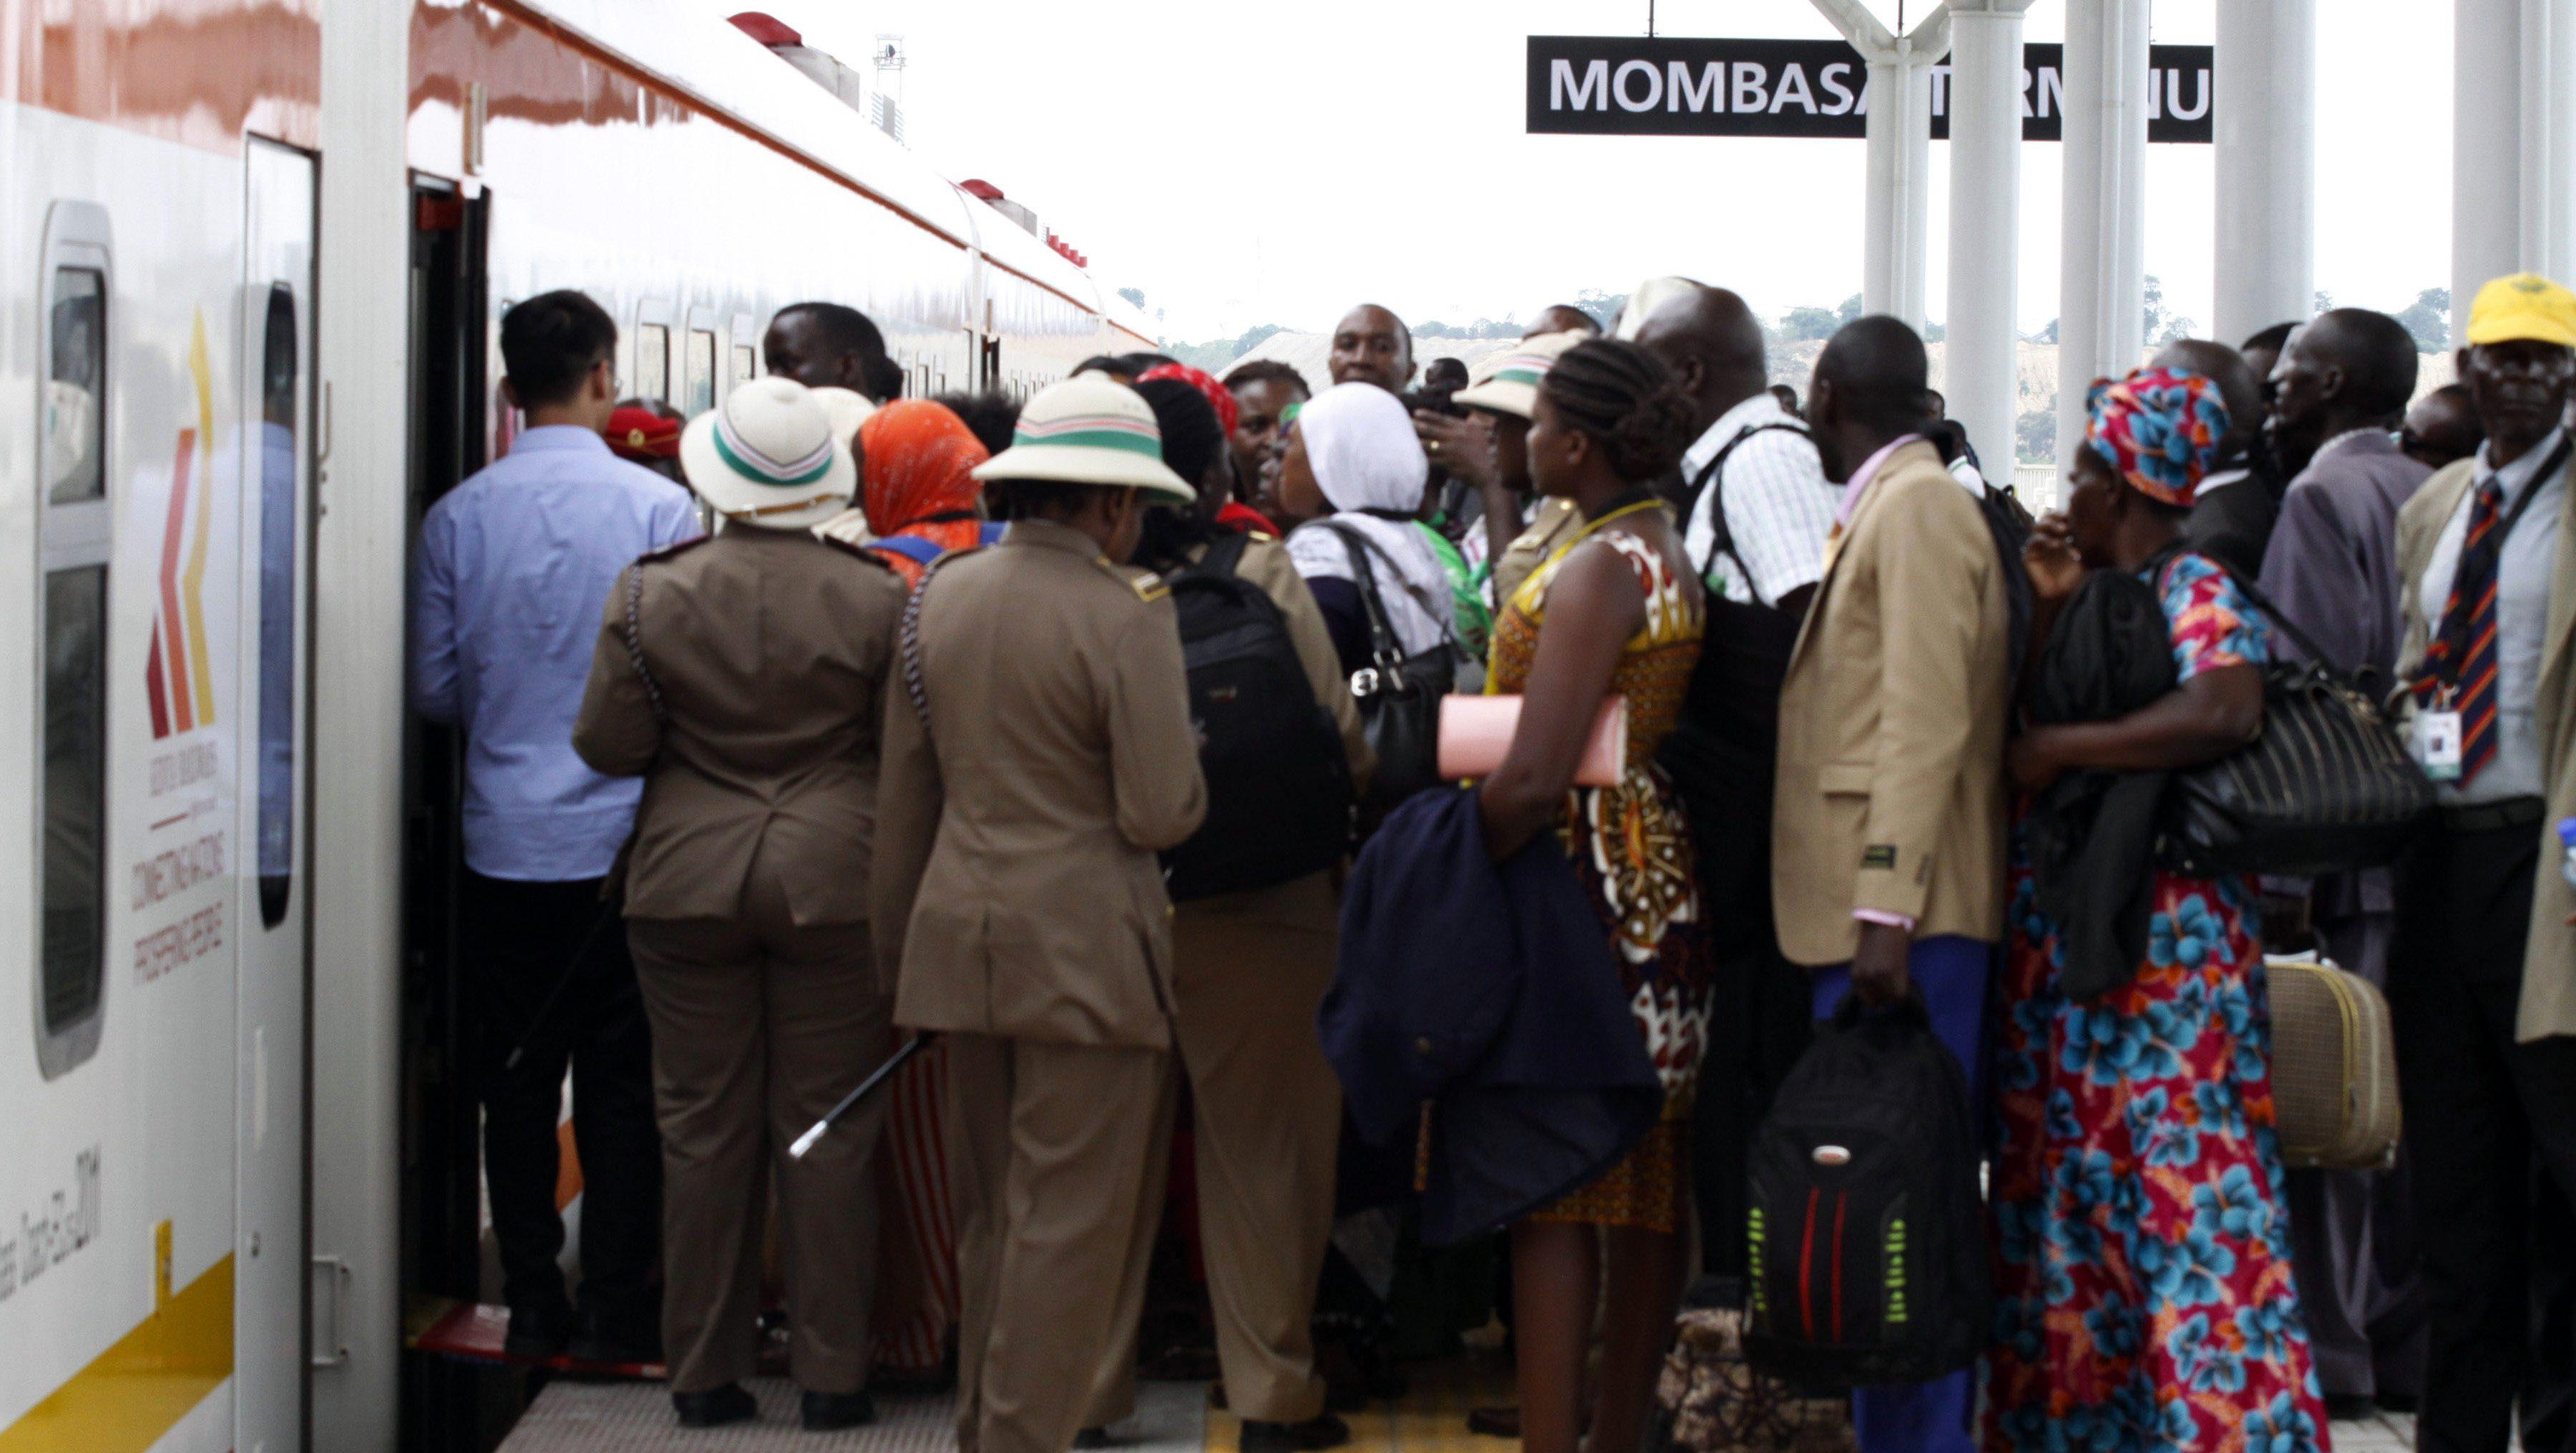 Kenyans wait to board a train at the Mombasa Terminus in Nairobi, Kenya Wednesday, May 31, 2017